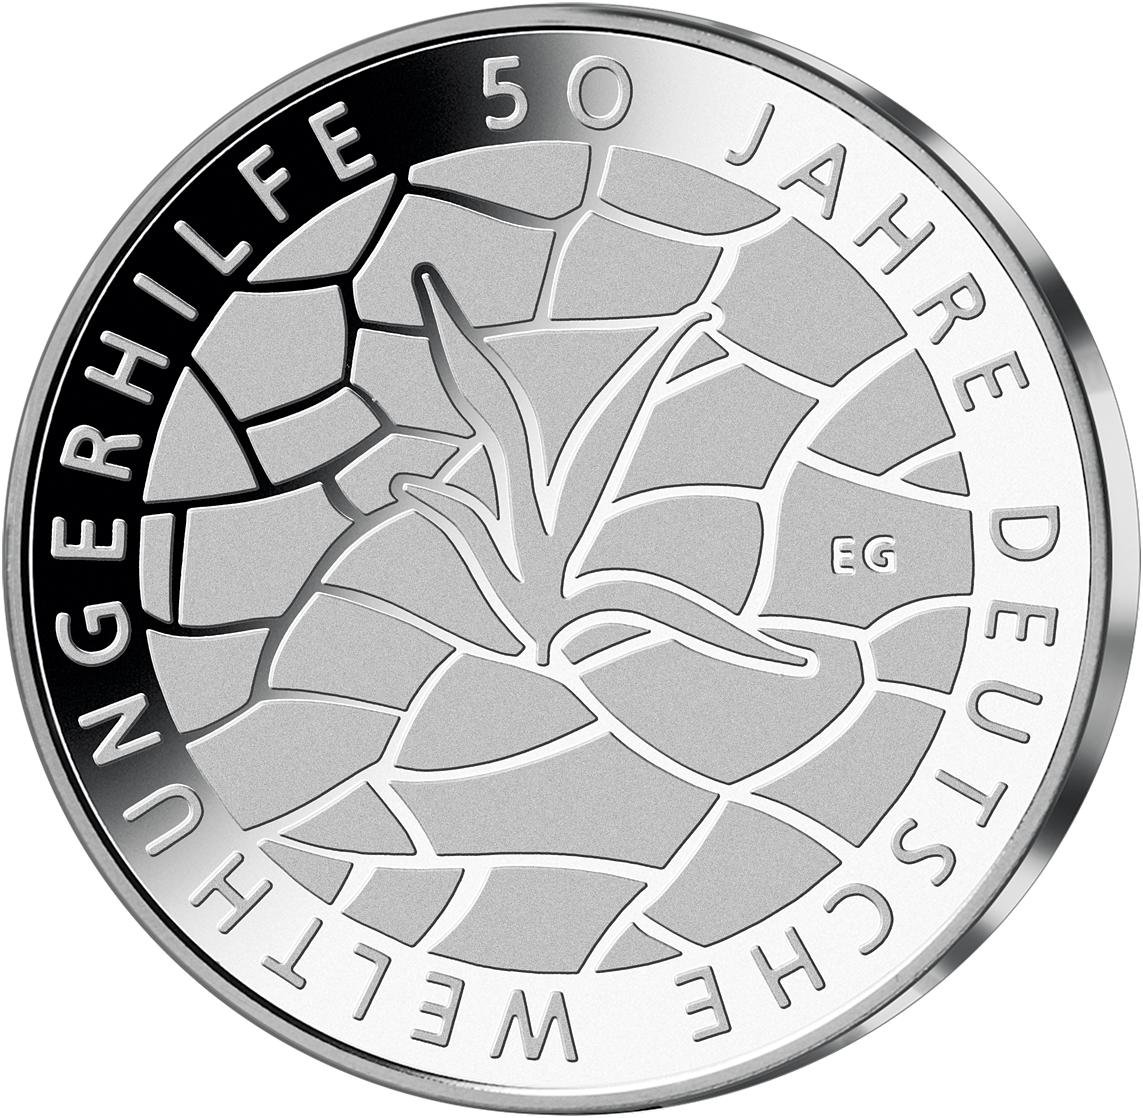 10 Euro Münze Brd Welthungerhilfe 2012 10 Euro Münzen Euro